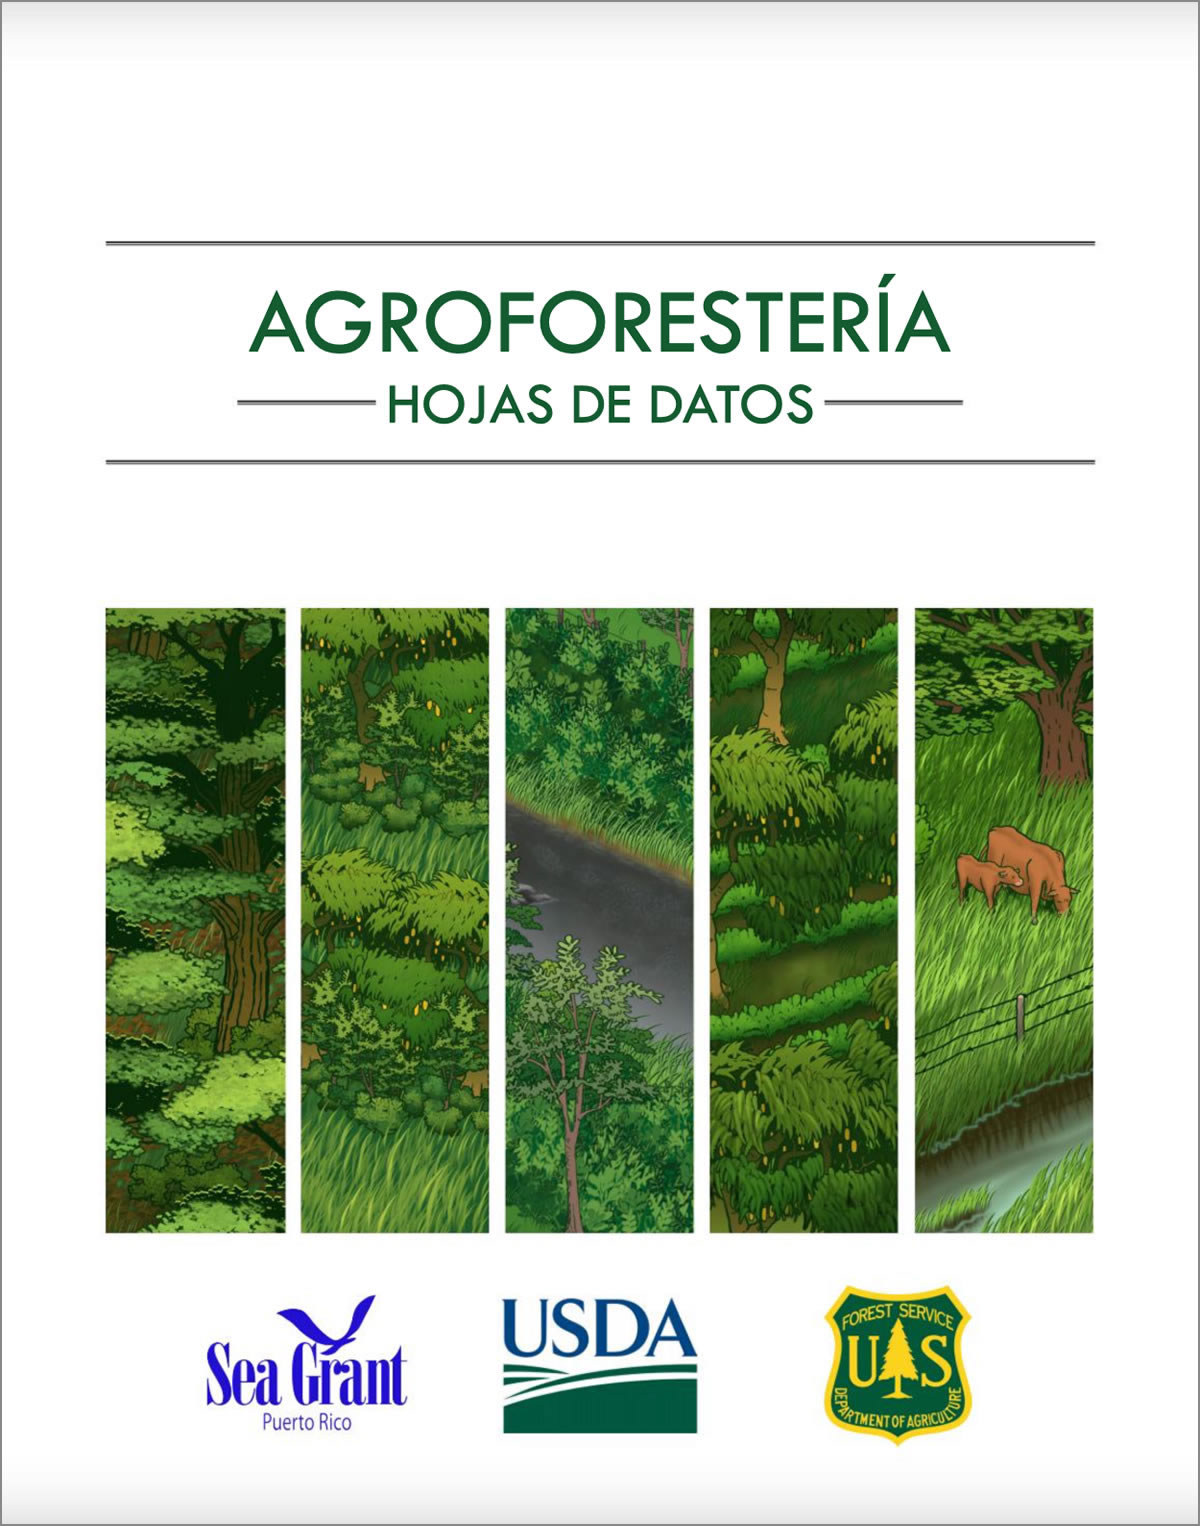 Hojas de datos de agroforestería